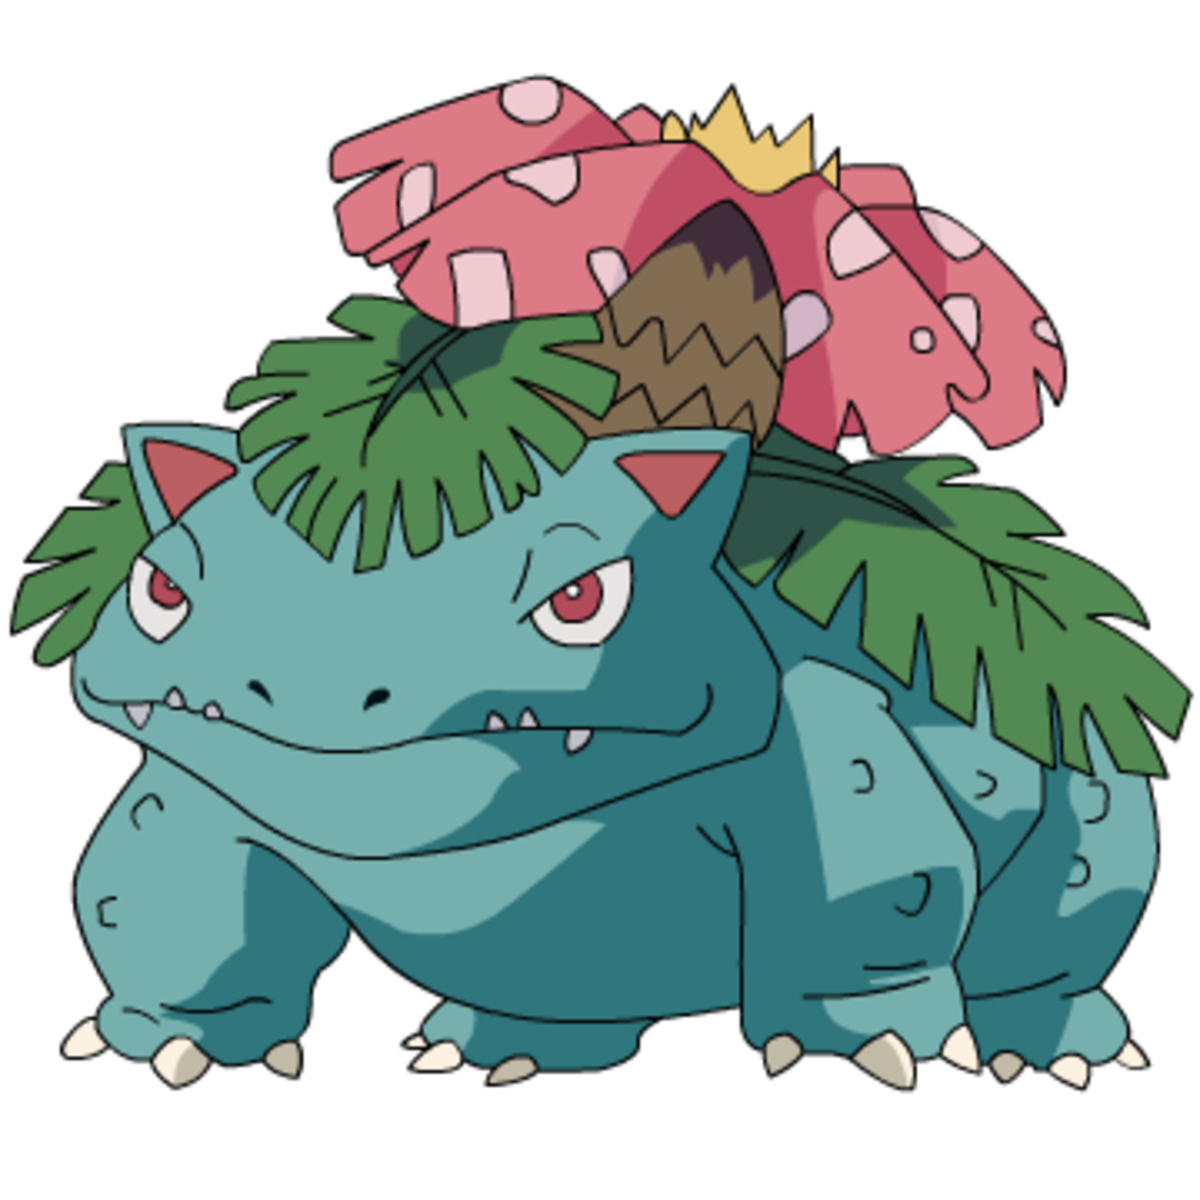 Pokémon: Venusaur Nicknames